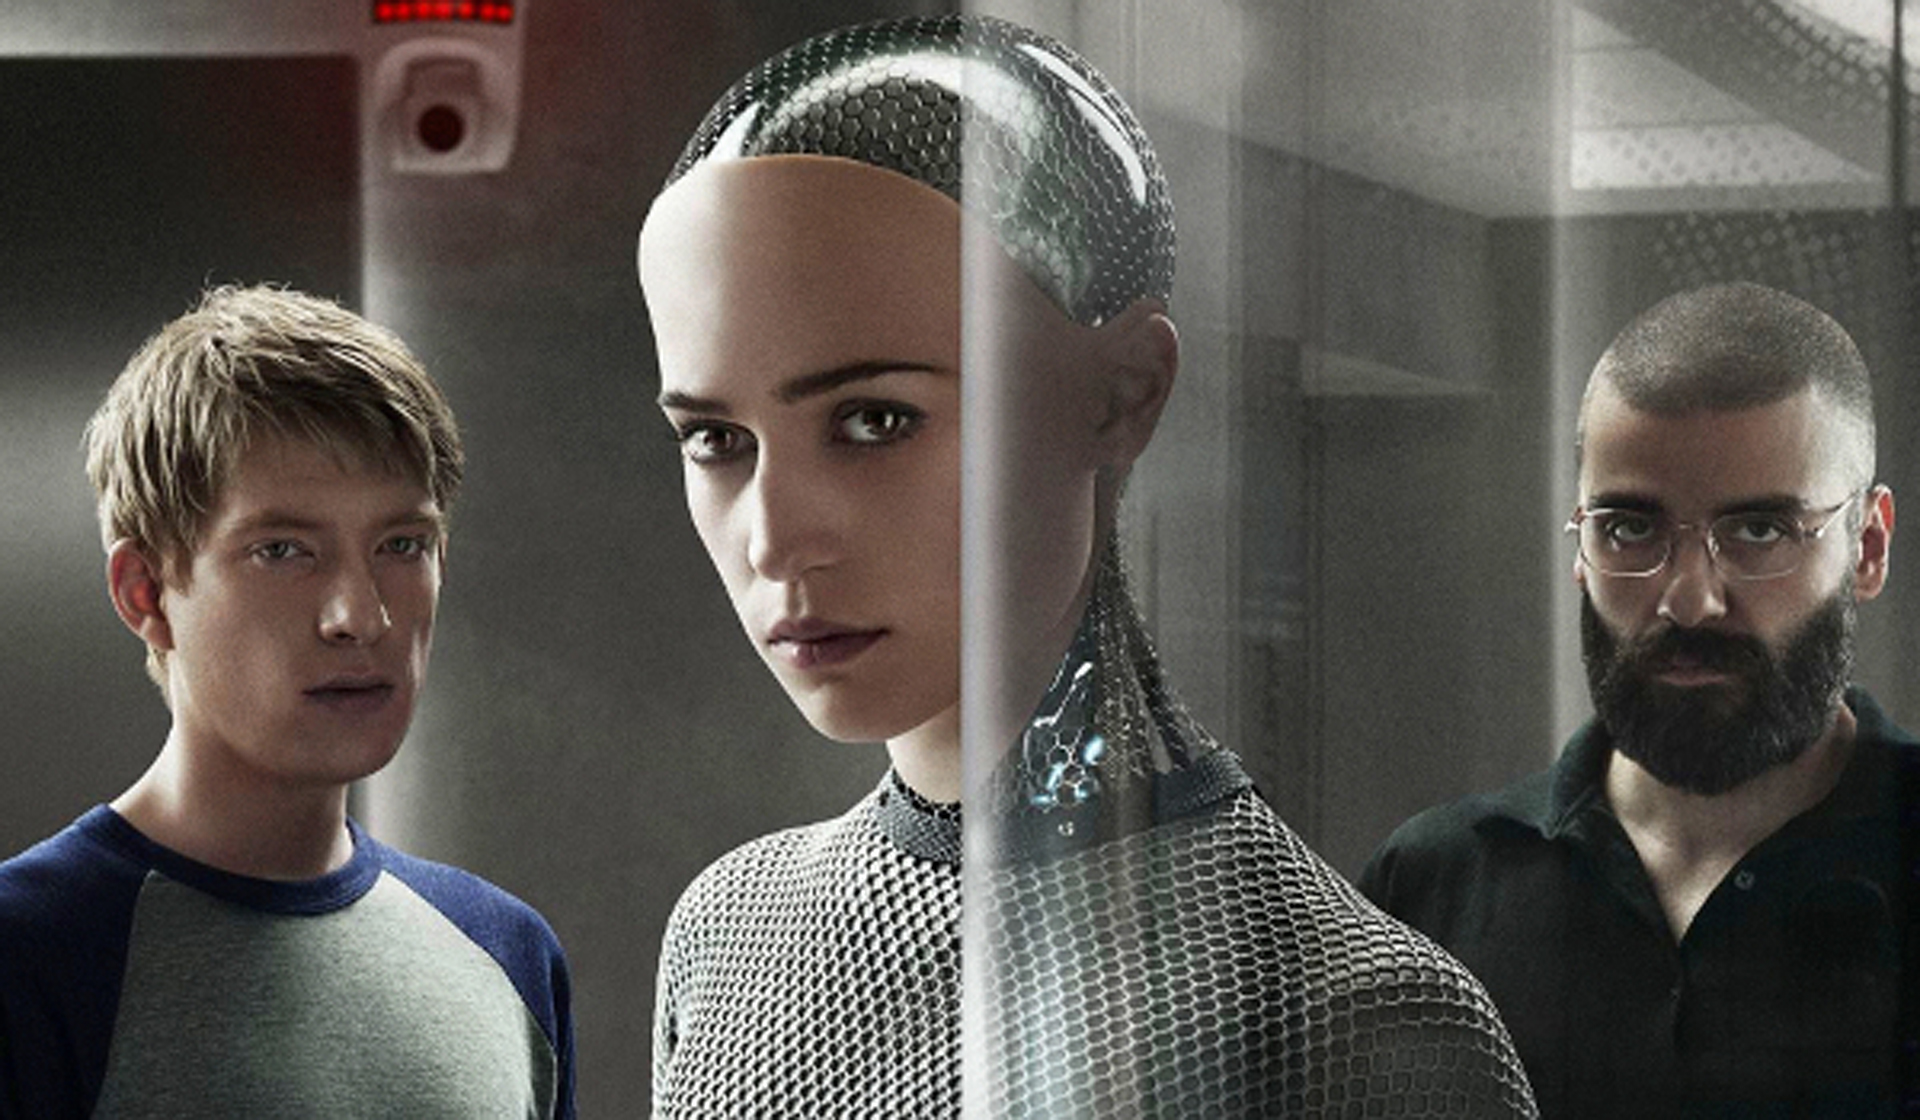 Domhnall Gleeson, Alicia Vikander and Oscar Isaac star in Ex Machina.